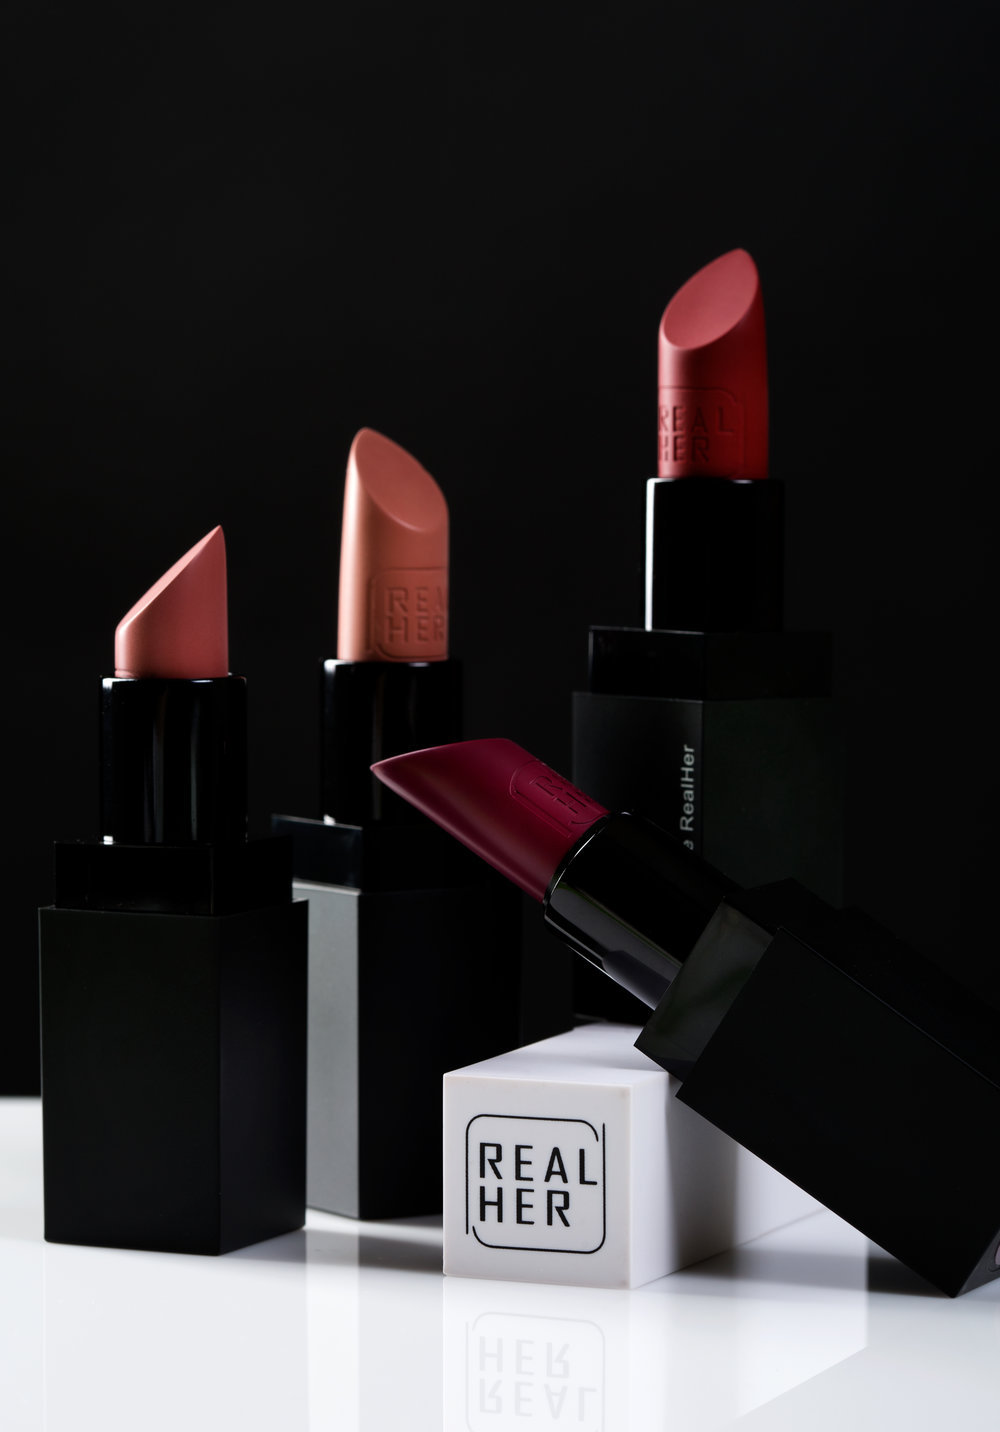 realher mocha girl beauty lipstick swatch